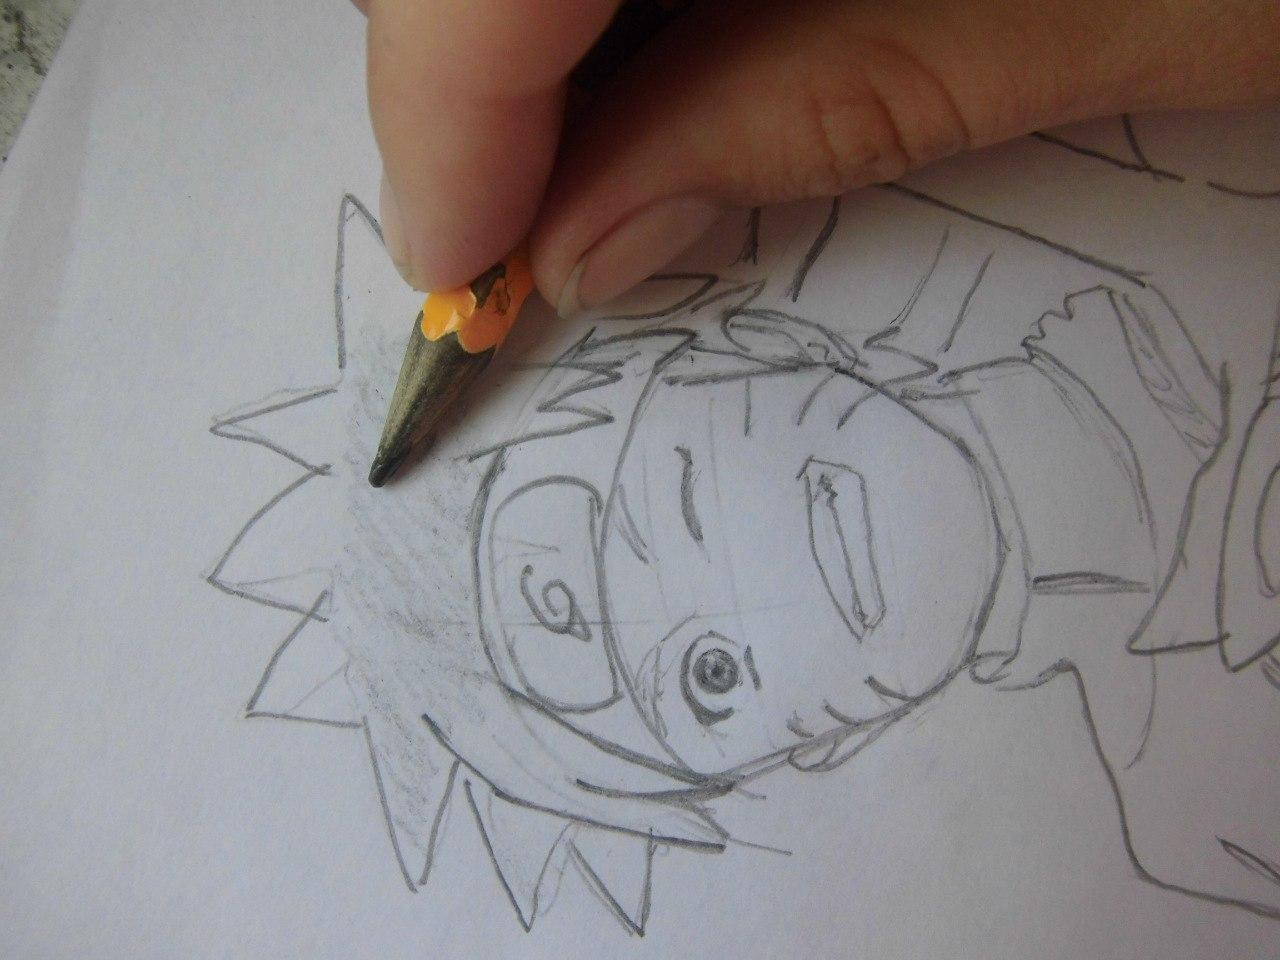 Рисуем Наруто с ножом - шаг 6